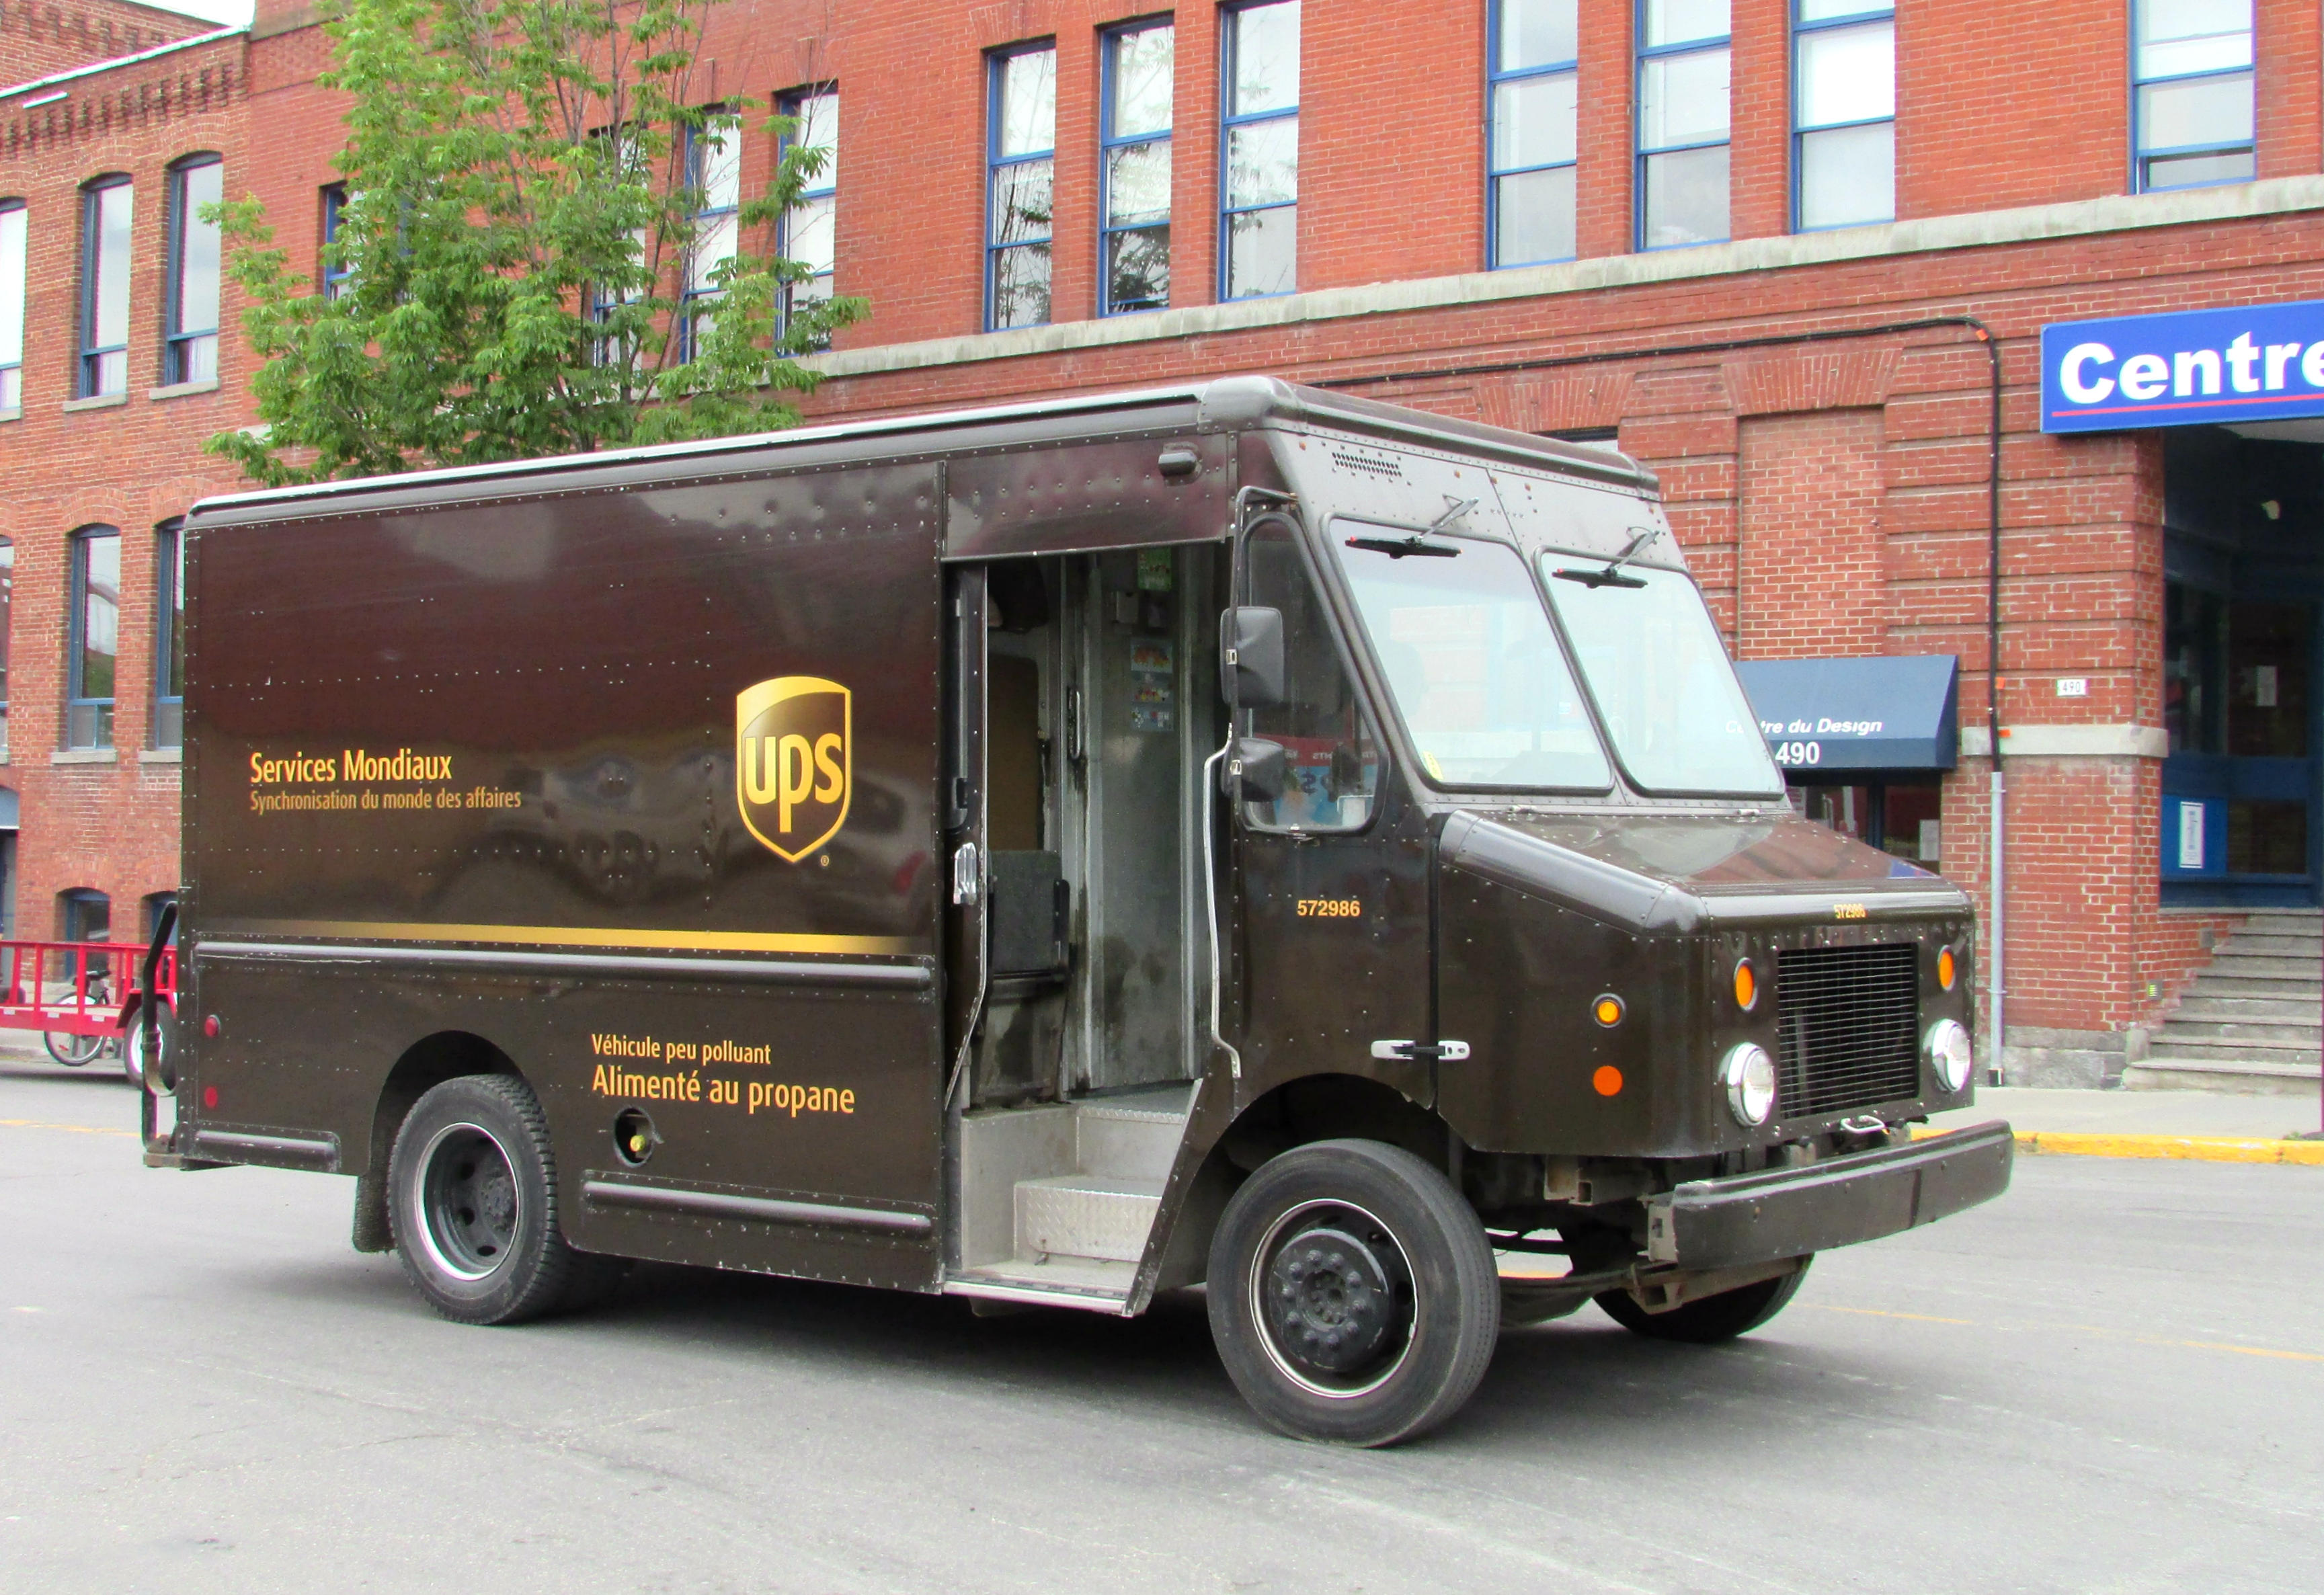 File:UPS package car.jpg - Wikimedia Commons